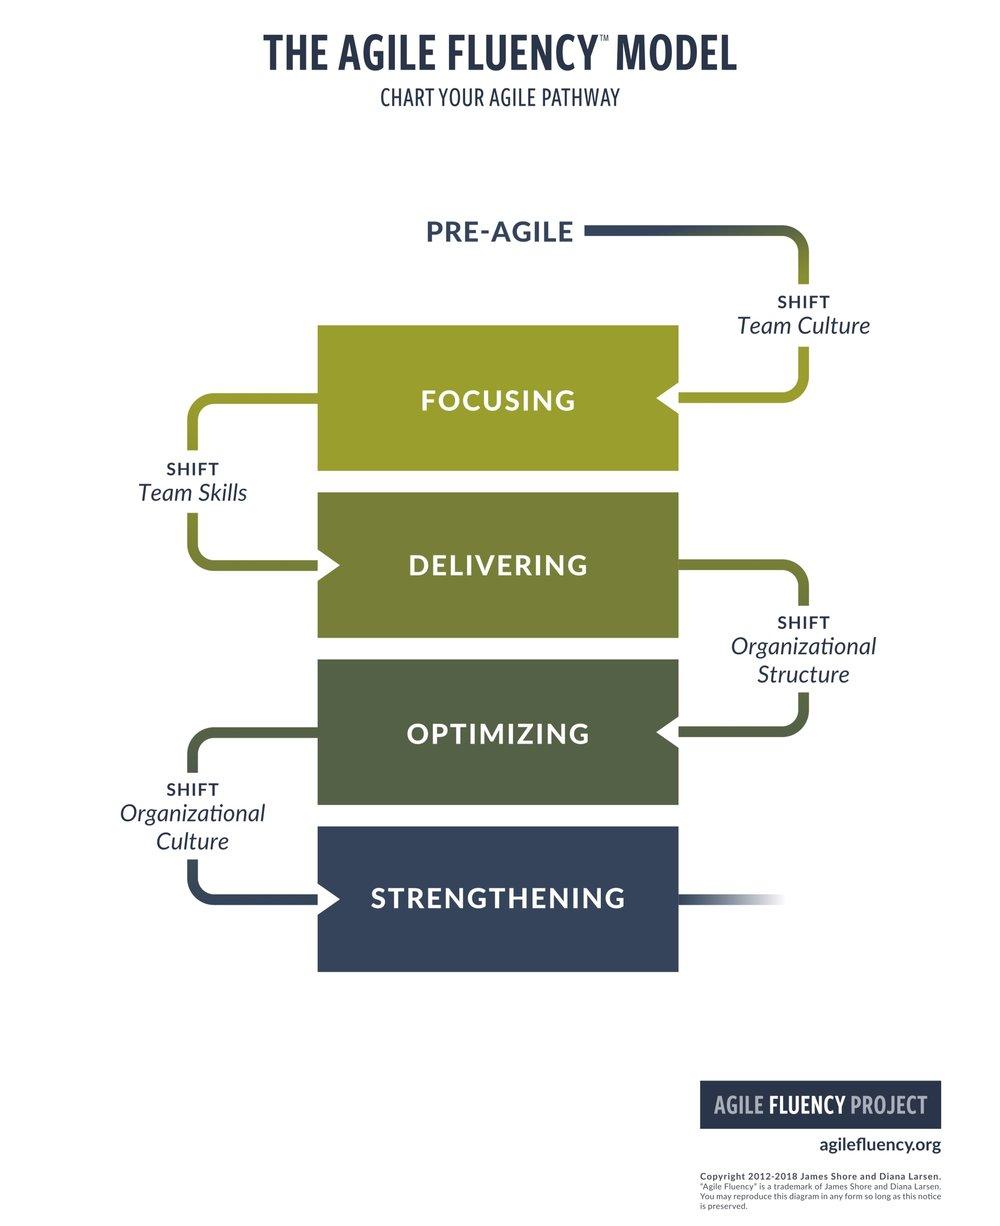 agile-fluency-model-v2-simple-portrait-page.jpg